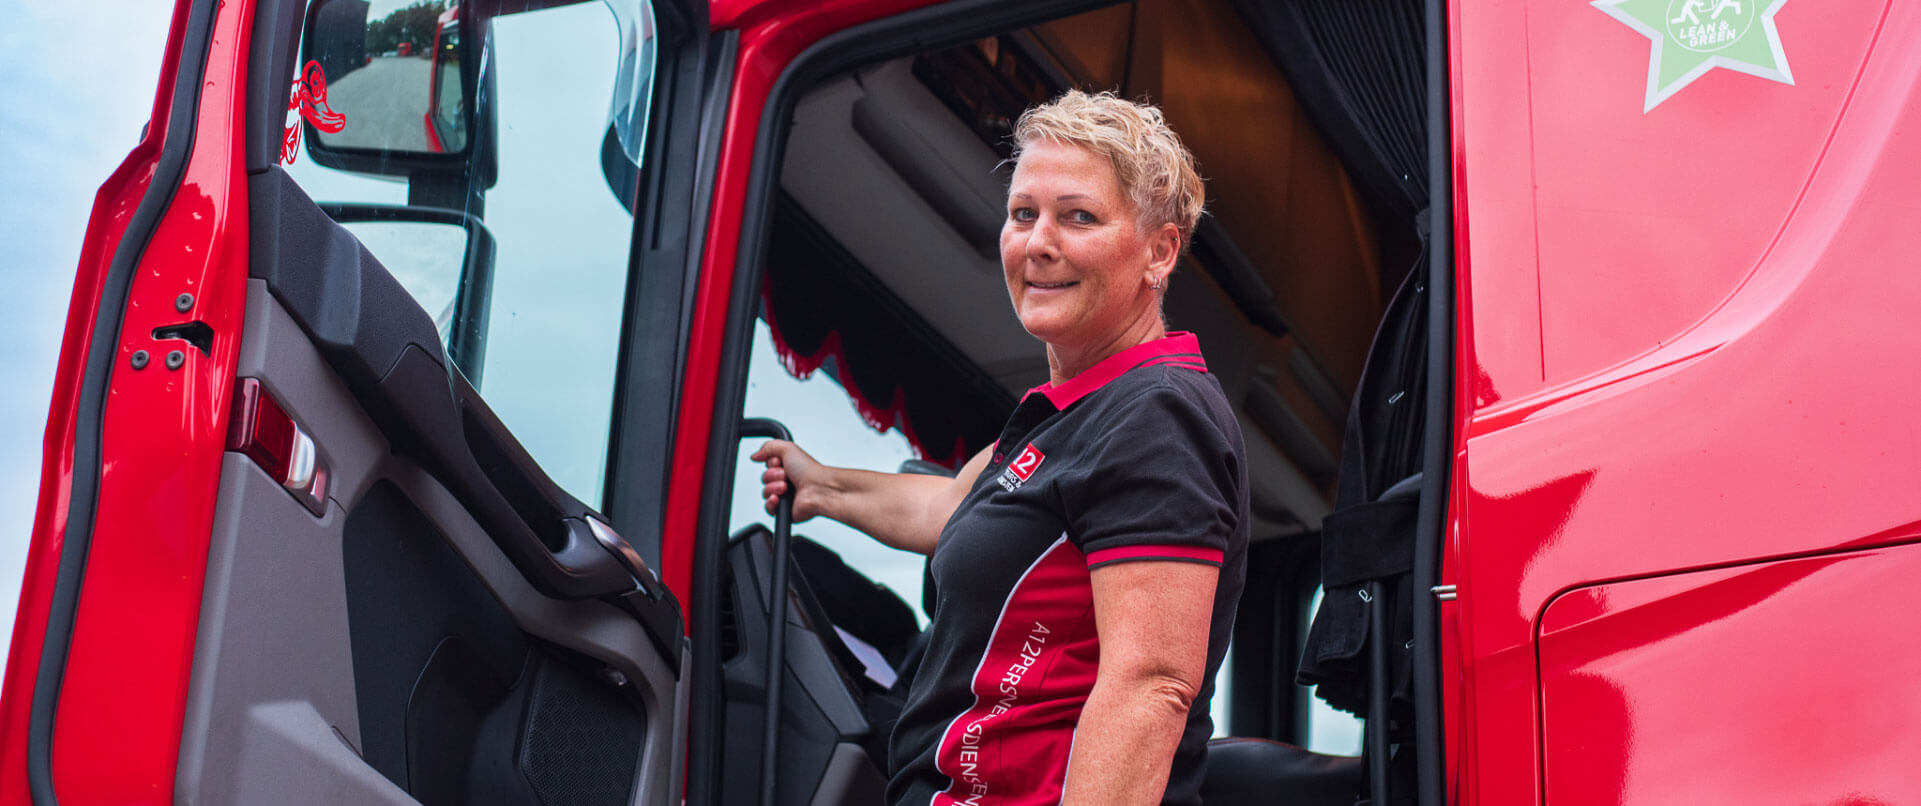 a12personeelsdiensten-werken-als-chauffeur-sigrid-koopmans(1)(1)